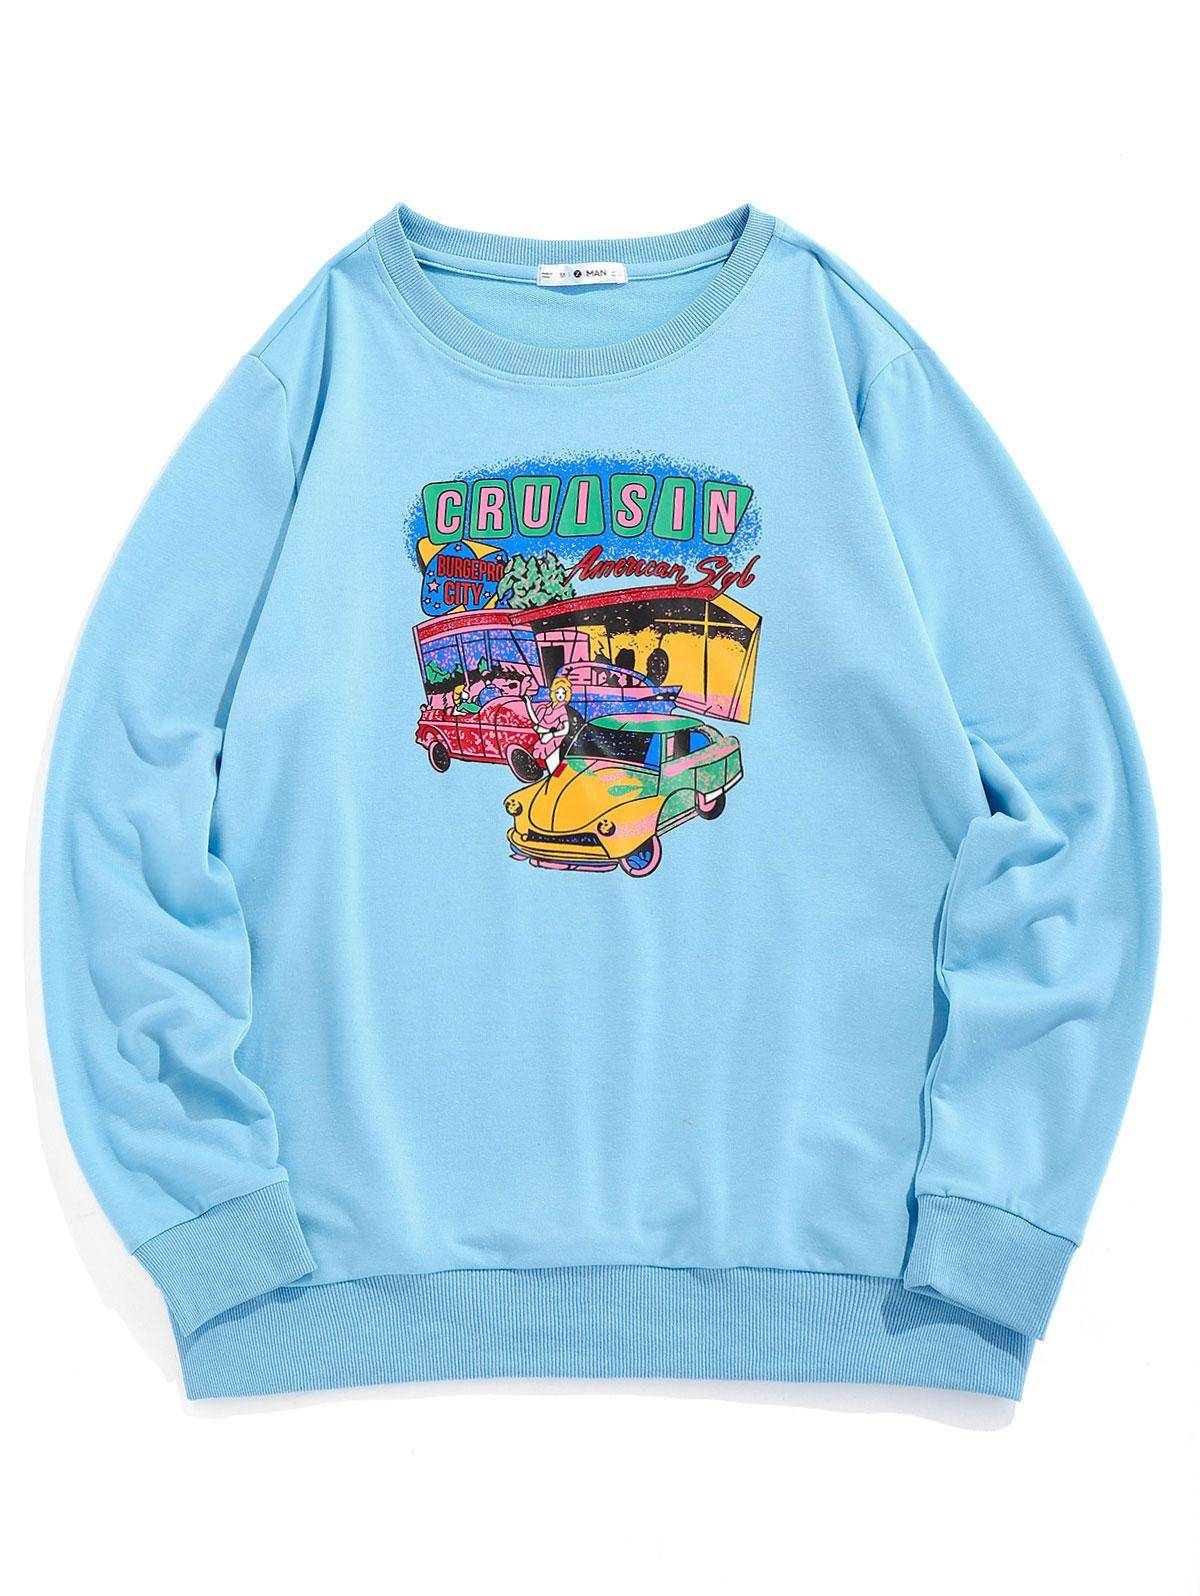 ZAFUL Cartoon Car Print Graphic Sweatshirt in LIGHT BLUE - Size: 2X-Large